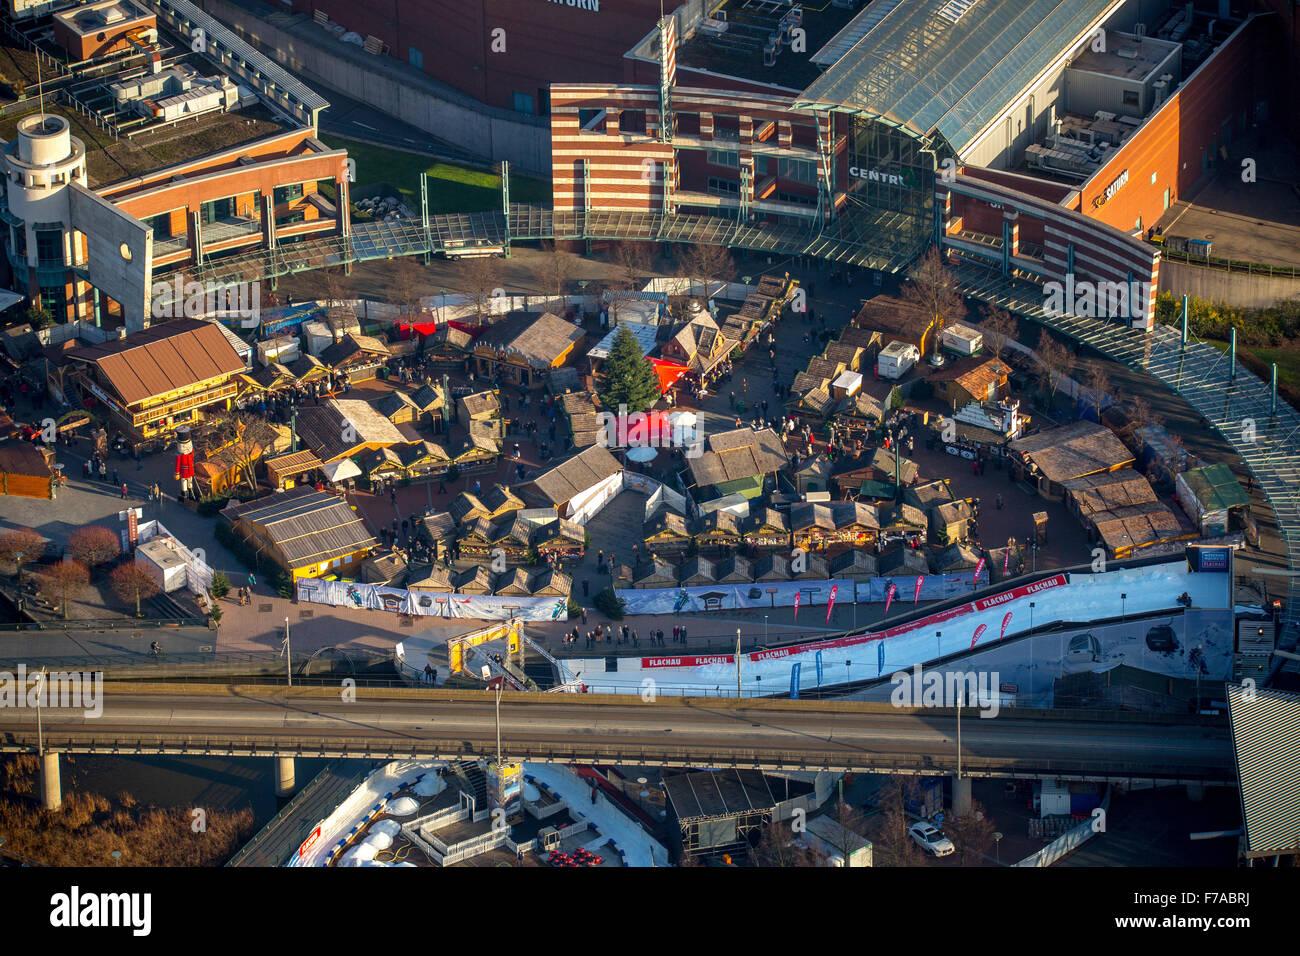 Christmas Market At The Centro Oberhausen Oberhausen Ruhr